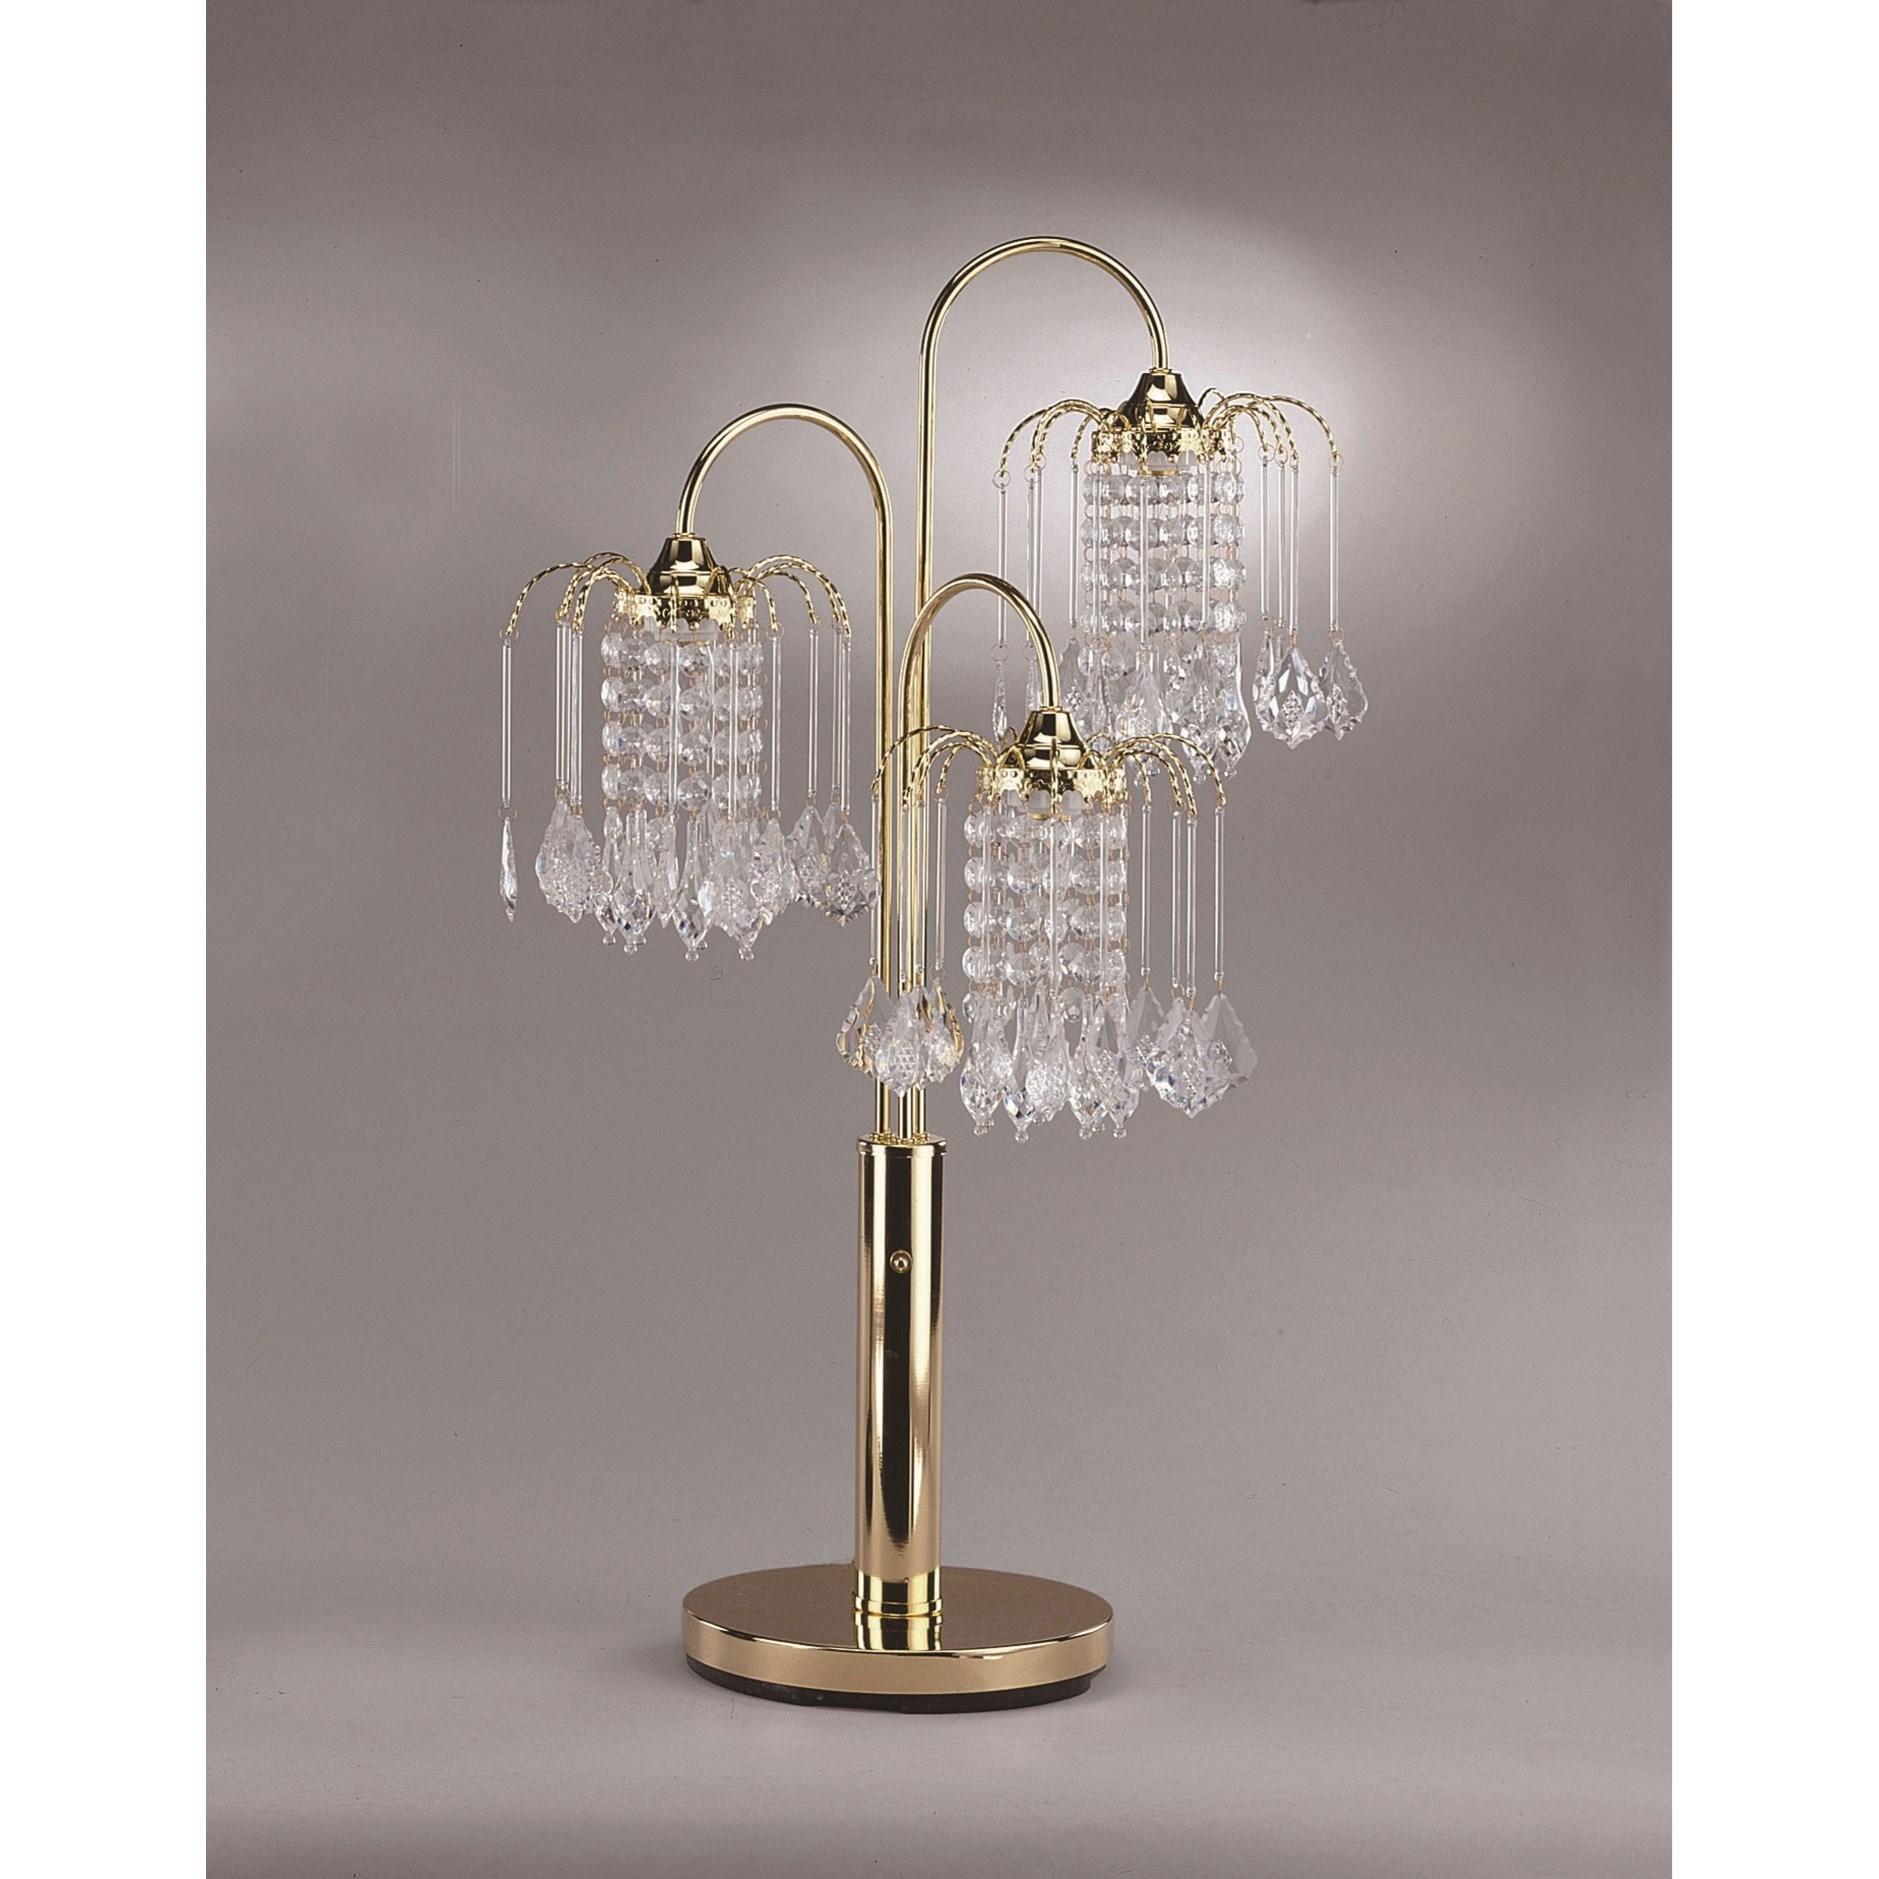 Rain Table Lamp by Crown Mark at Nassau Furniture and Mattress